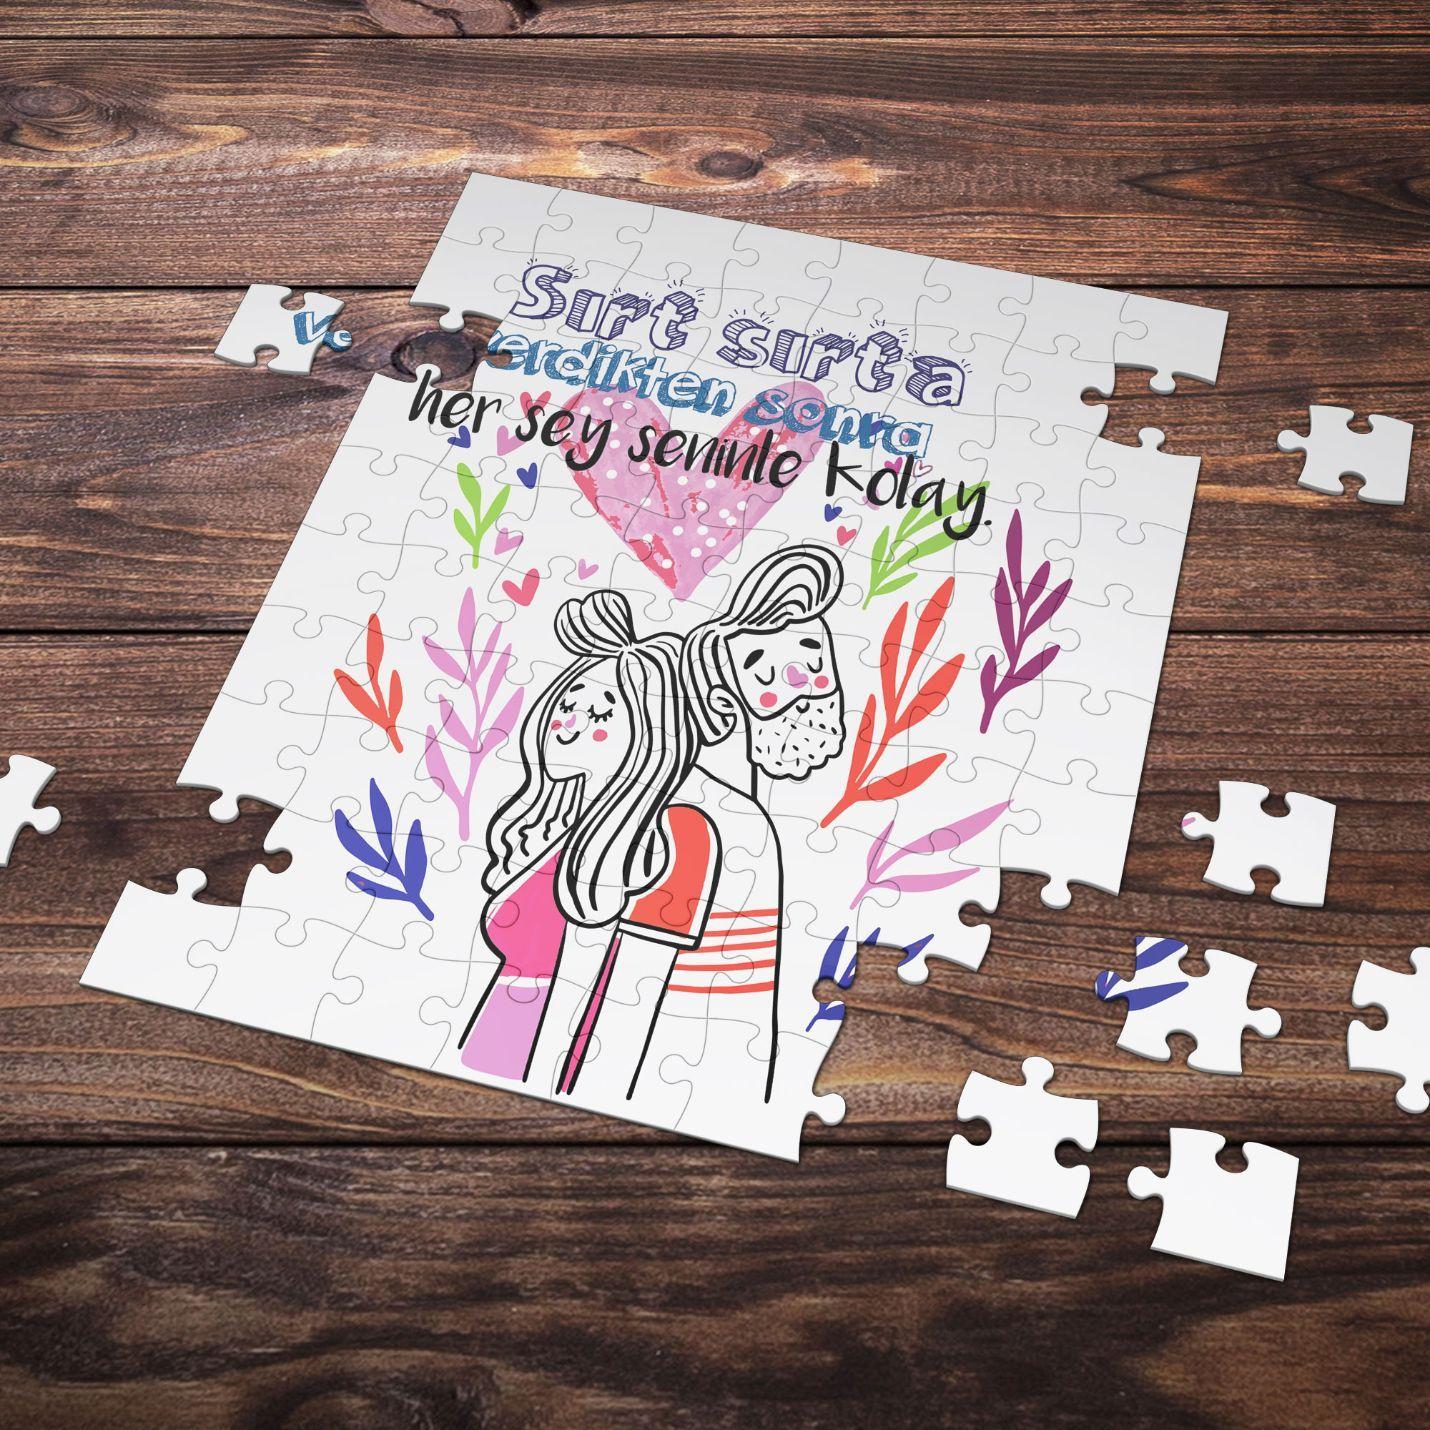 99 Parça Romantik Tasarımlı Puzzle Yapboz No11